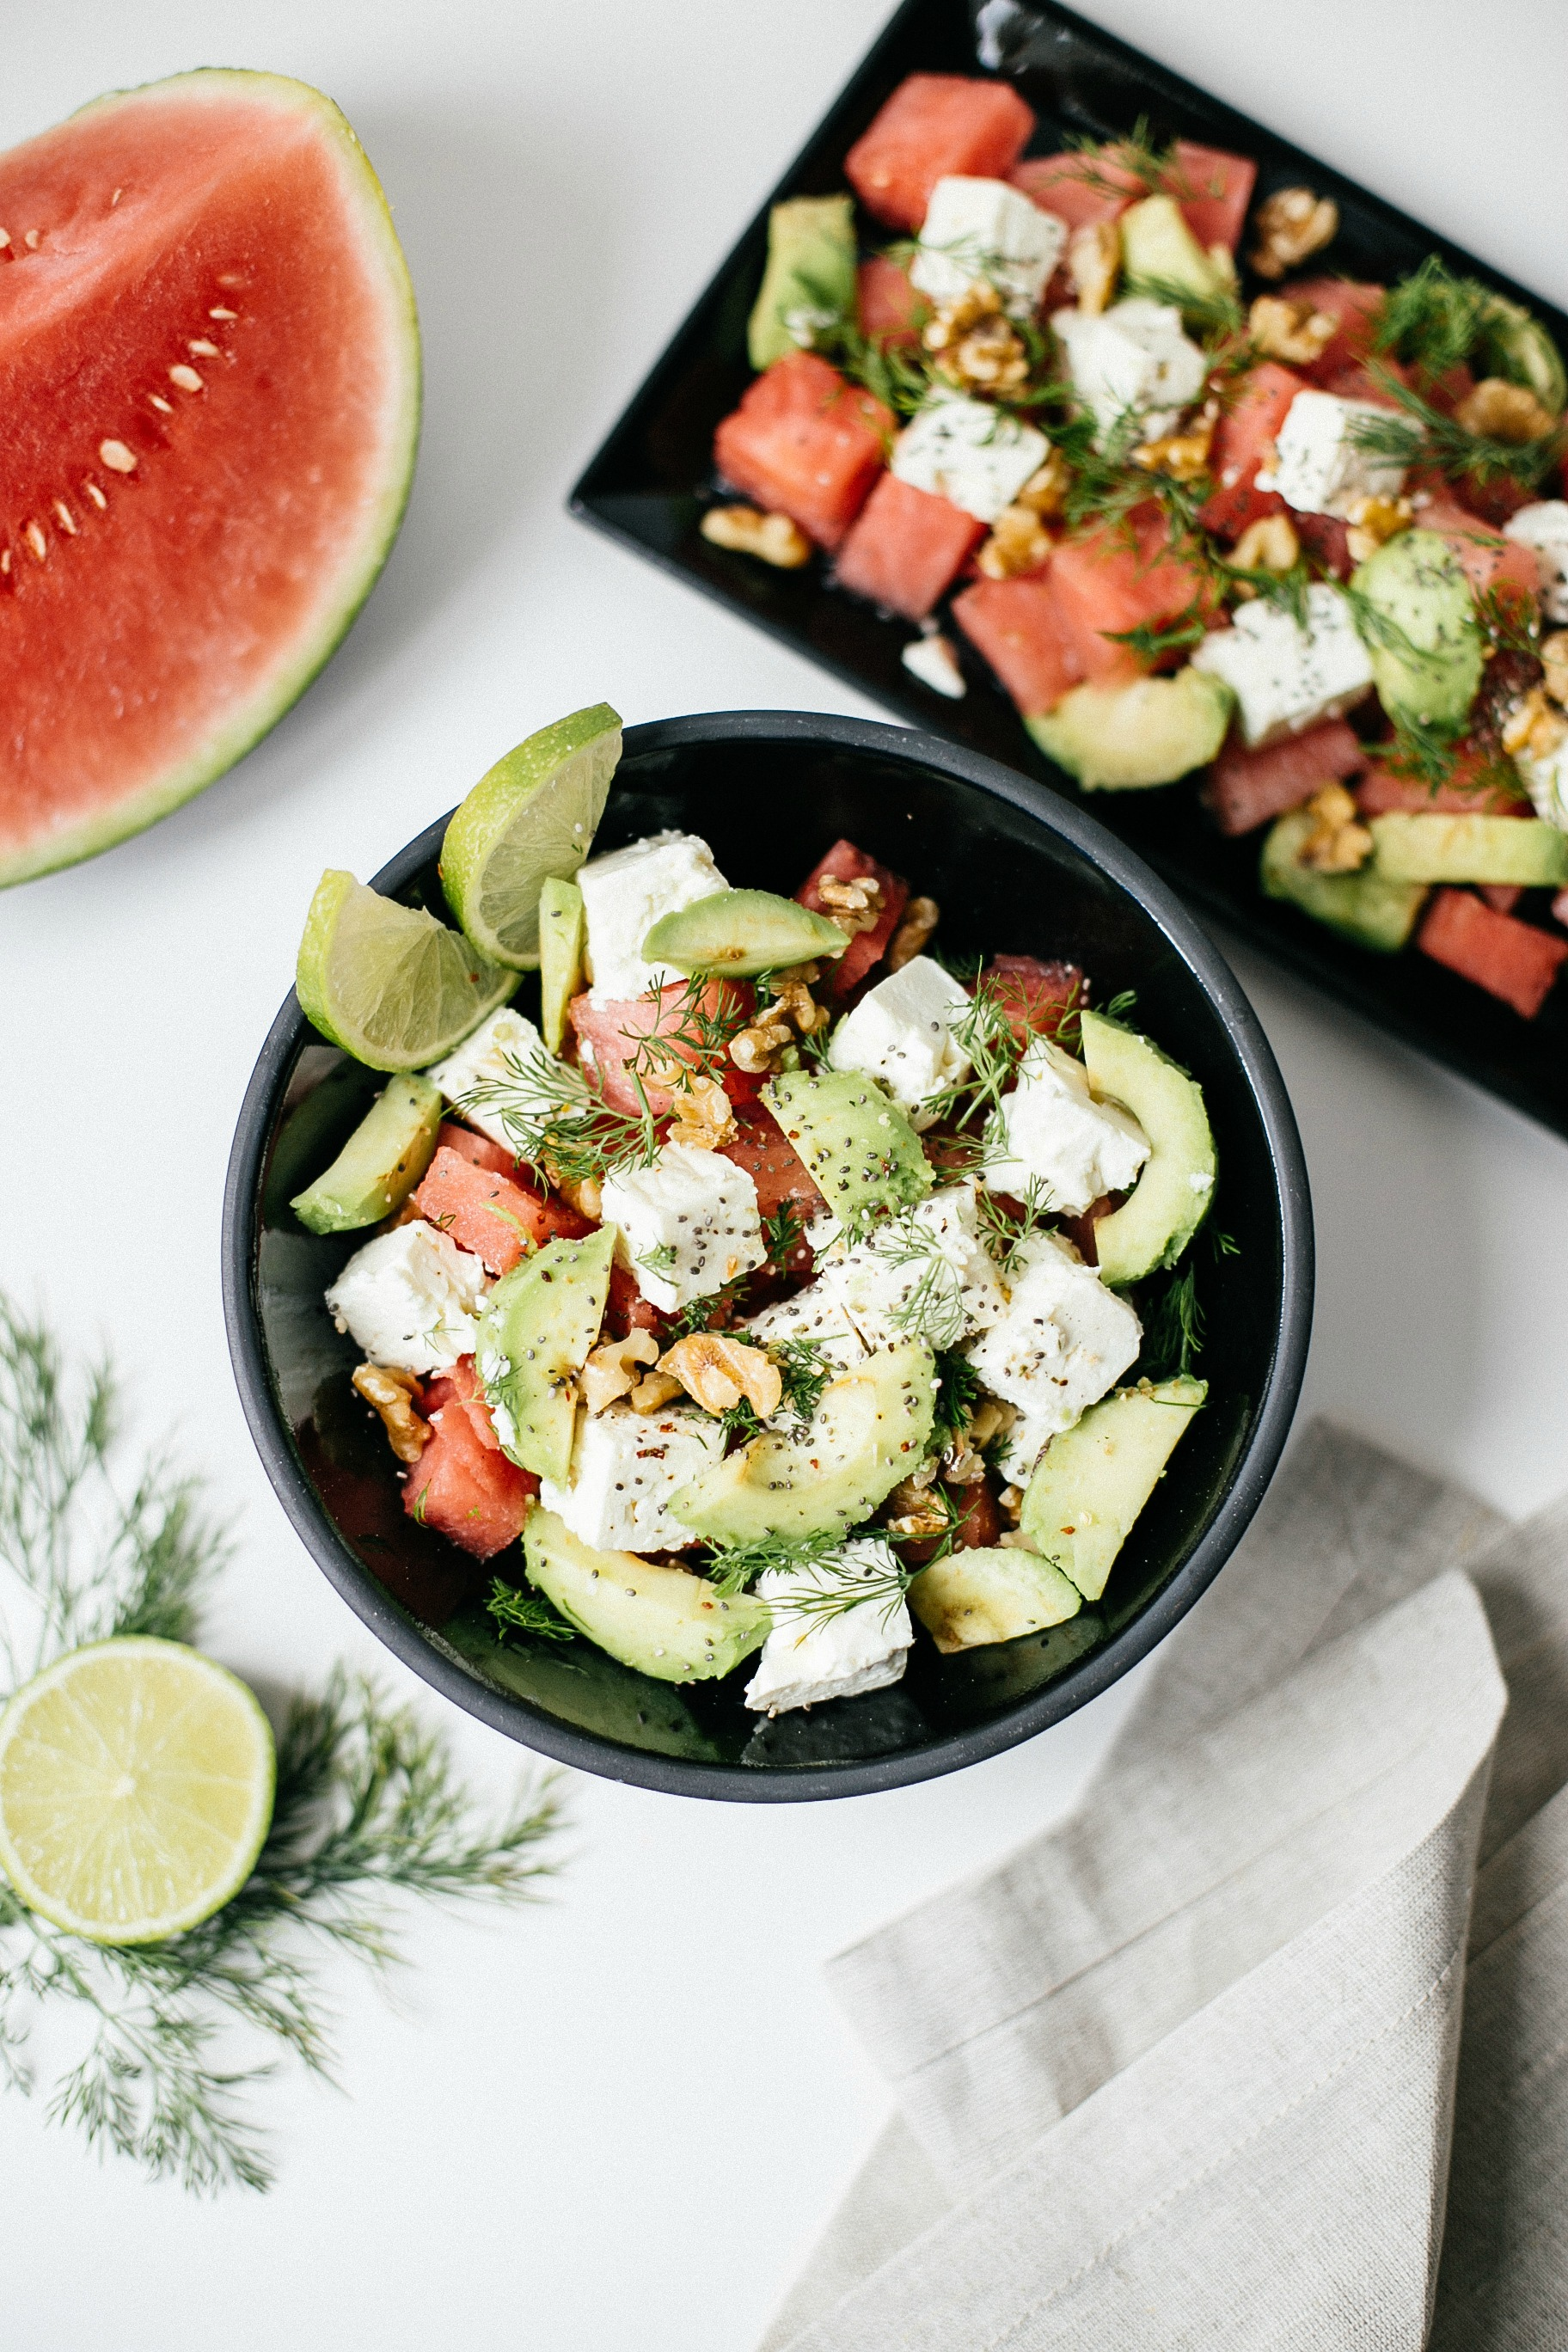 disi-couture-watermelon-avocado-summer-salad-fresh-easy-08